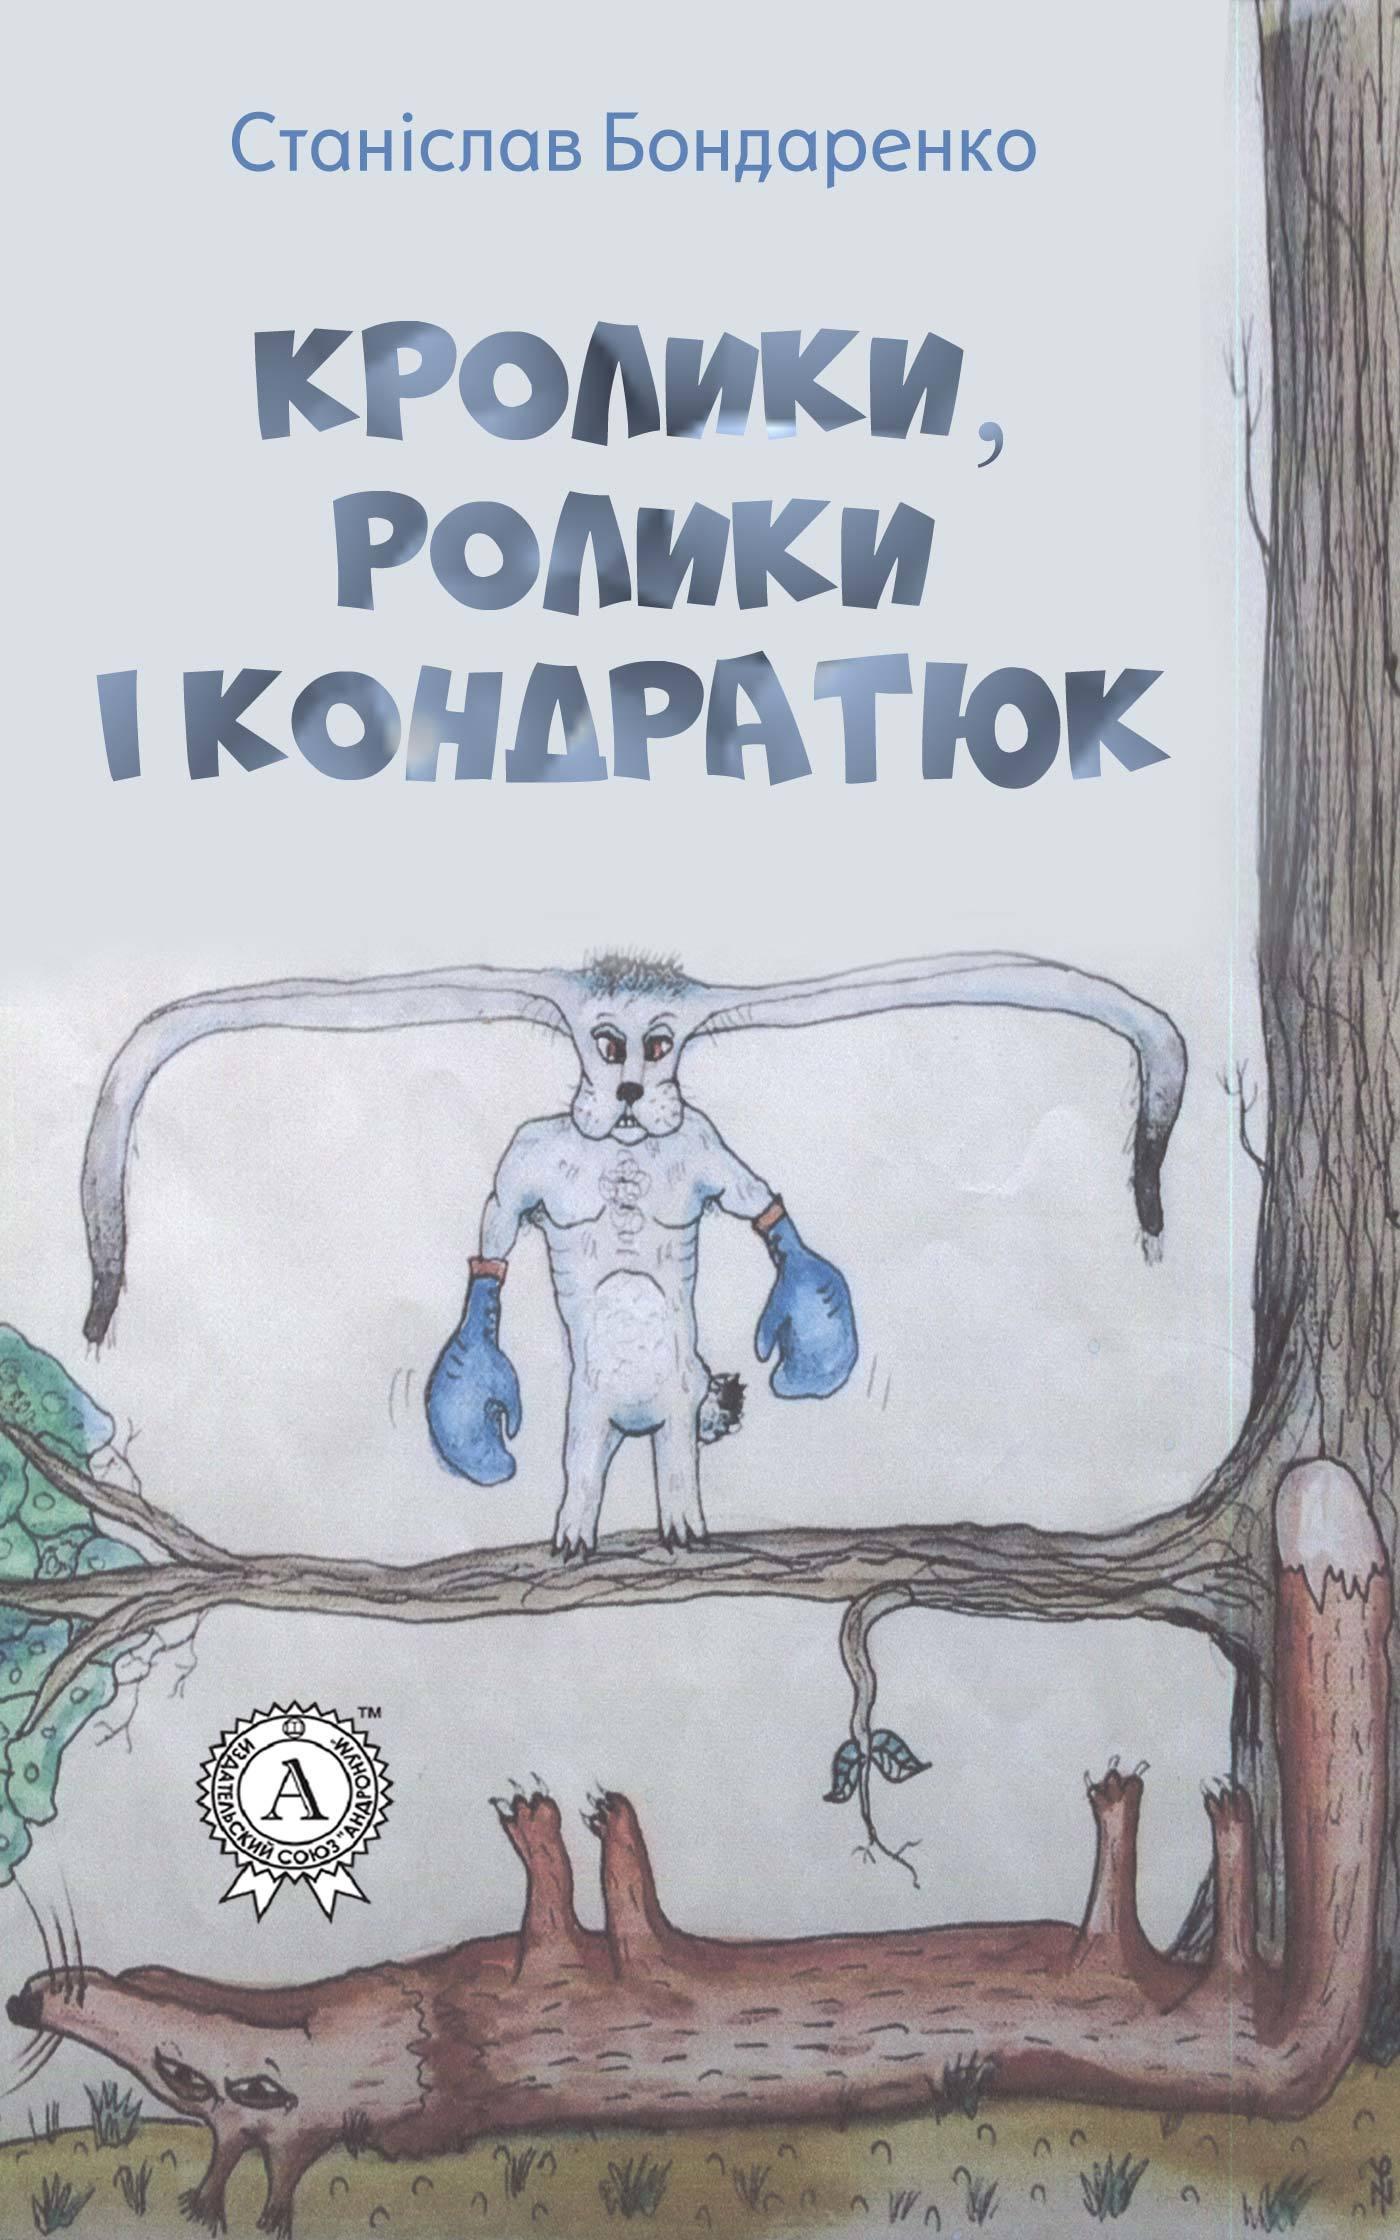 Станслав Бондаренко бесплатно